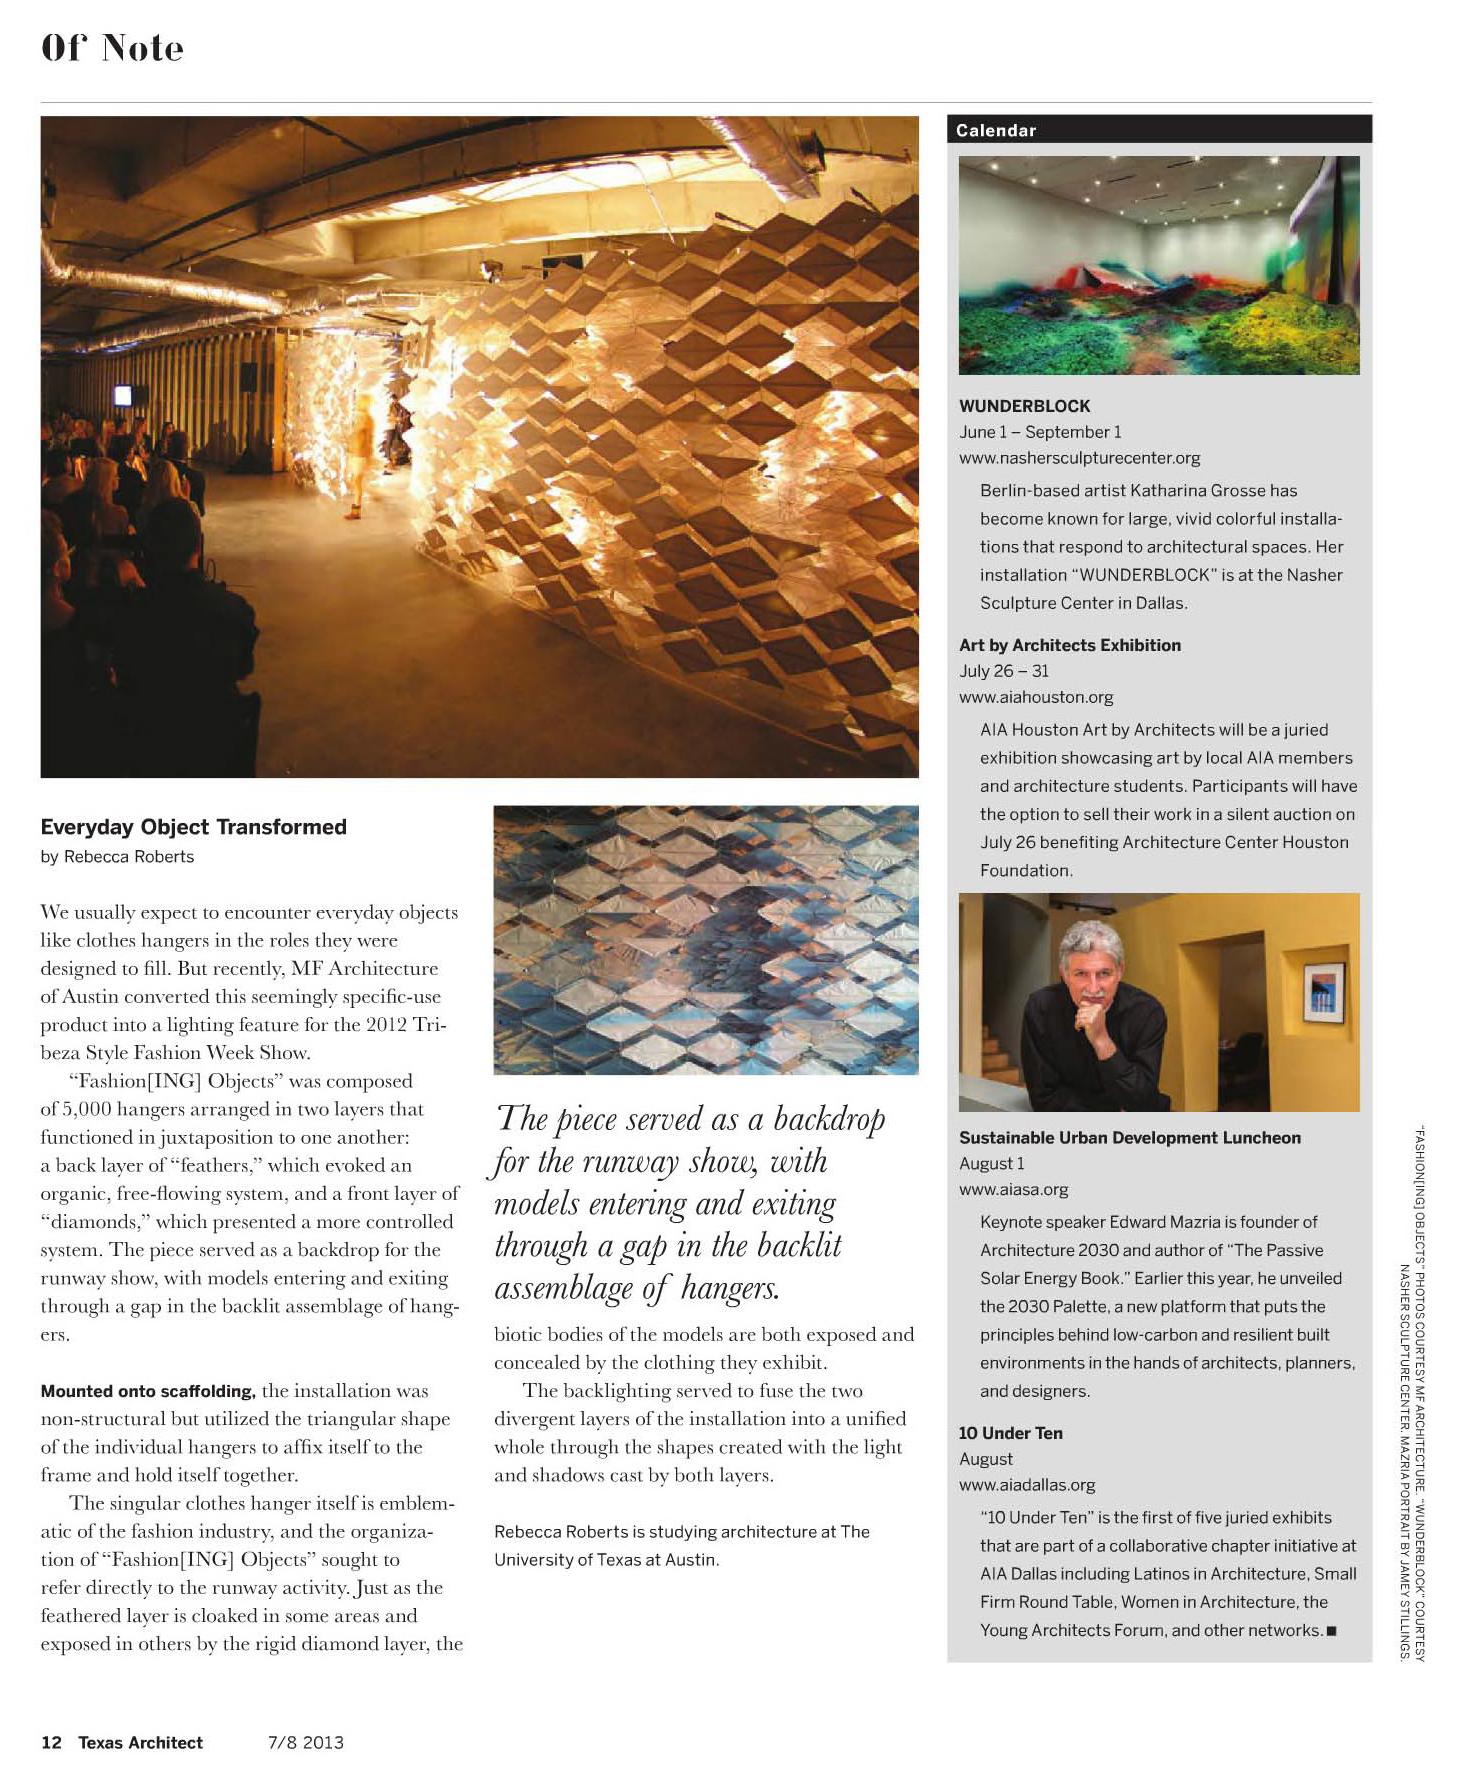 2013_1230_Matt Fajkus MF Architecture Texas Architect Spread.jpg